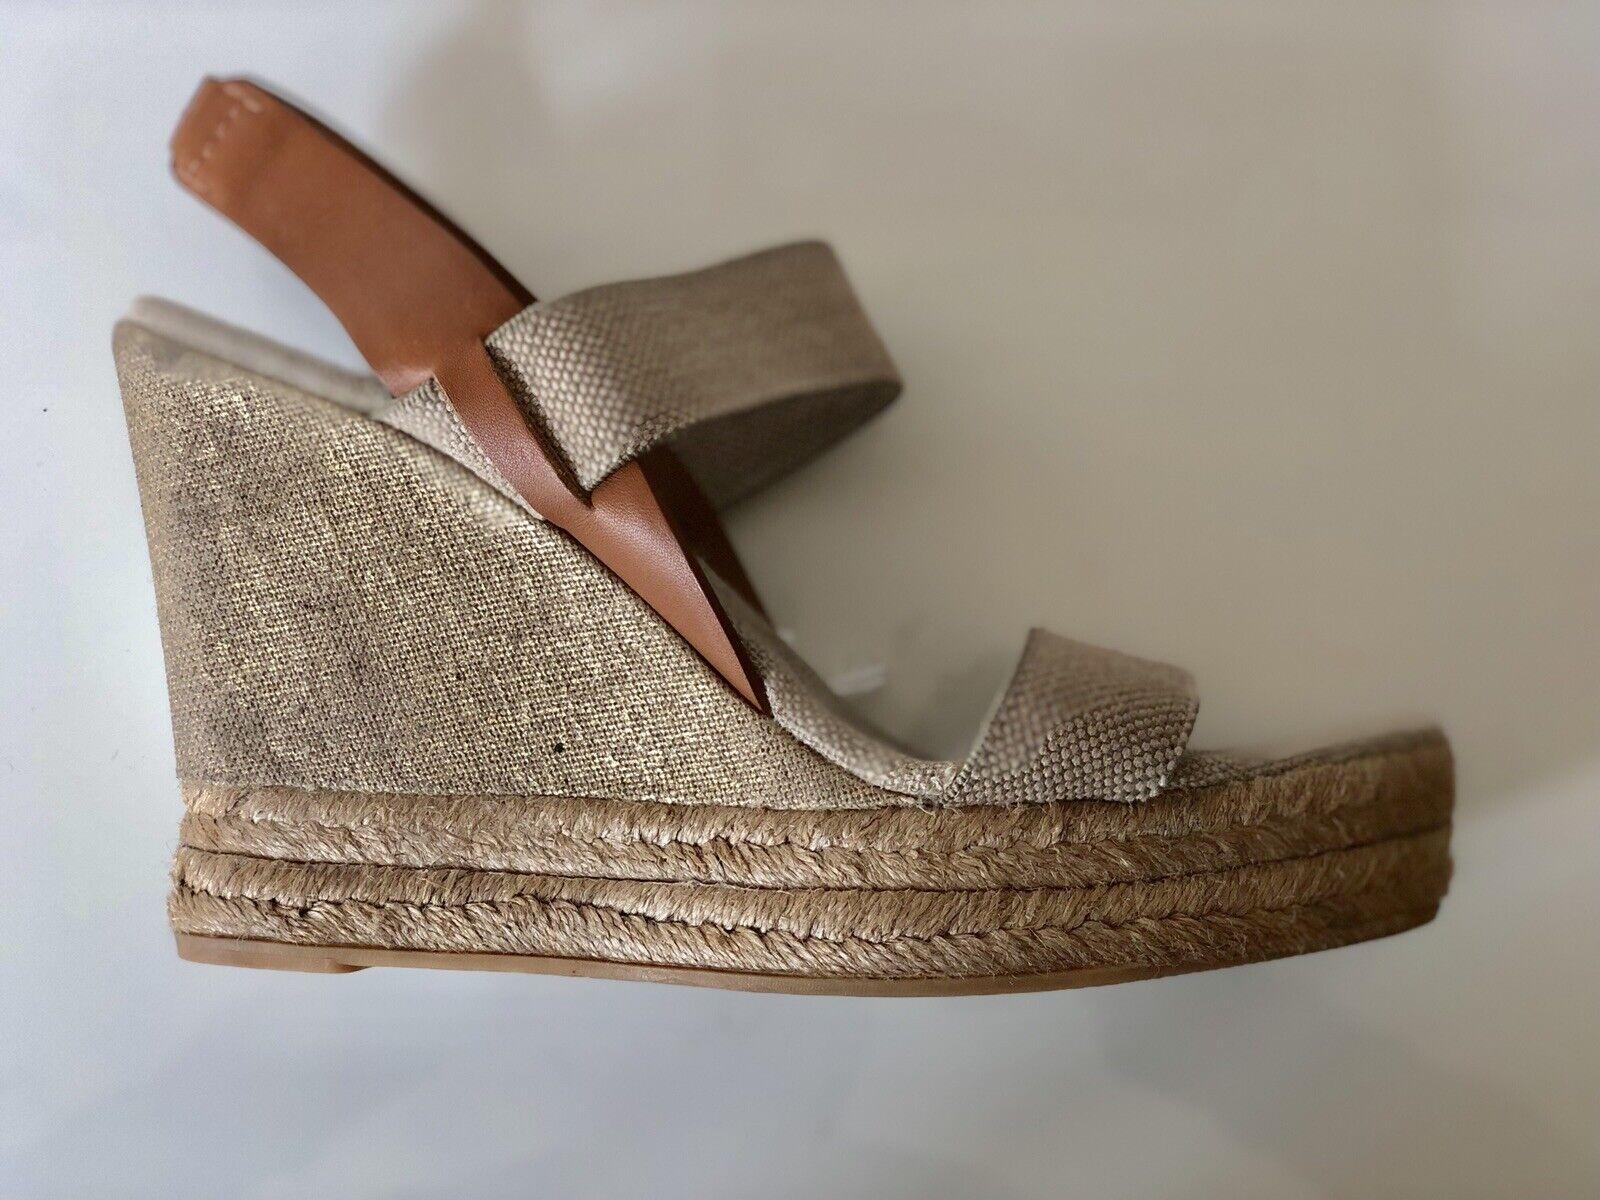 Tory Burch cuñas Plataformas Sandalias De Cuero Beige Tamaño 8.5 EE. UU. UK5.5